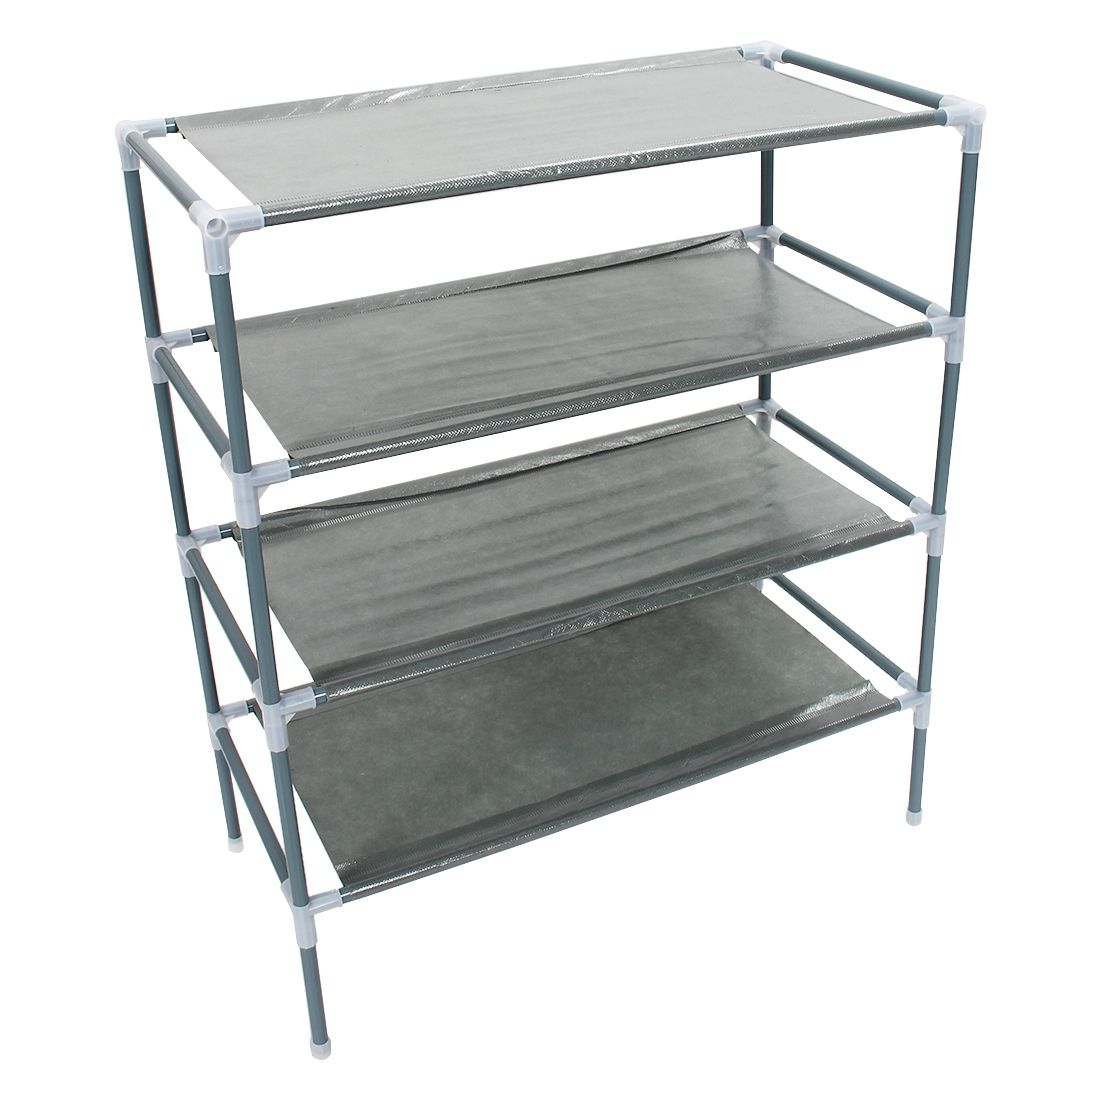 removable door shoe storage cabinet shelf DIY shoes storageremovable door shoe storage cabinet shelf DIY shoes storage